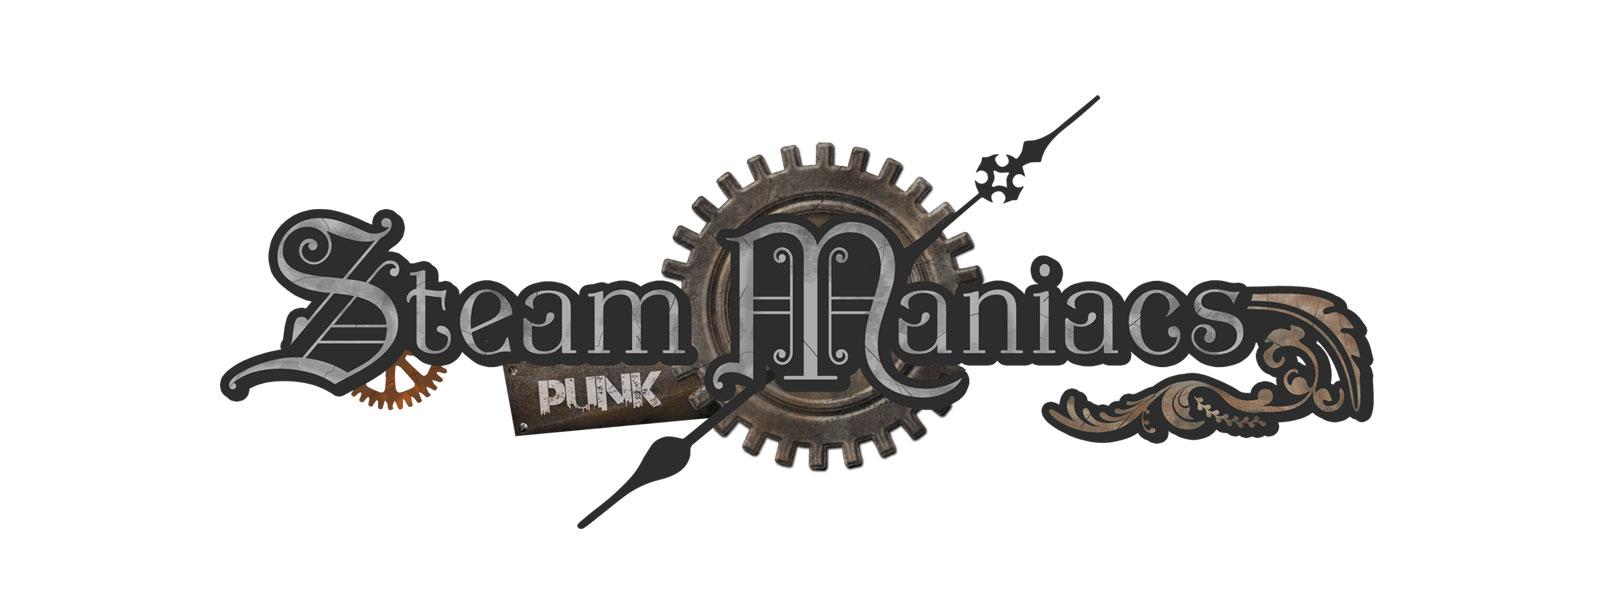 Steampunk-Maniacs-Logo-Graphicsbyte